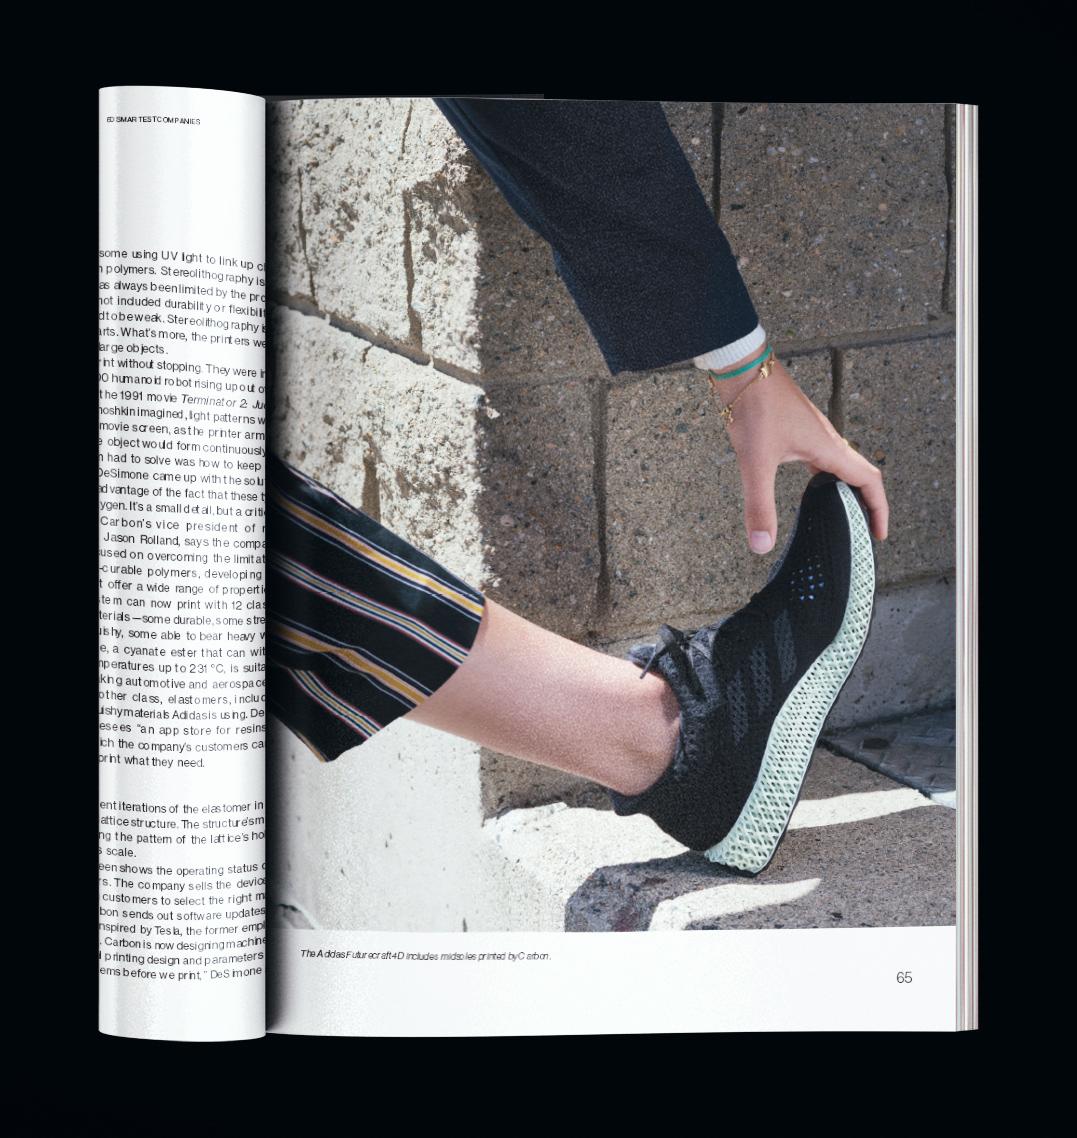 Adidas Futurecraft 4D  Photograph by Josh Mathews